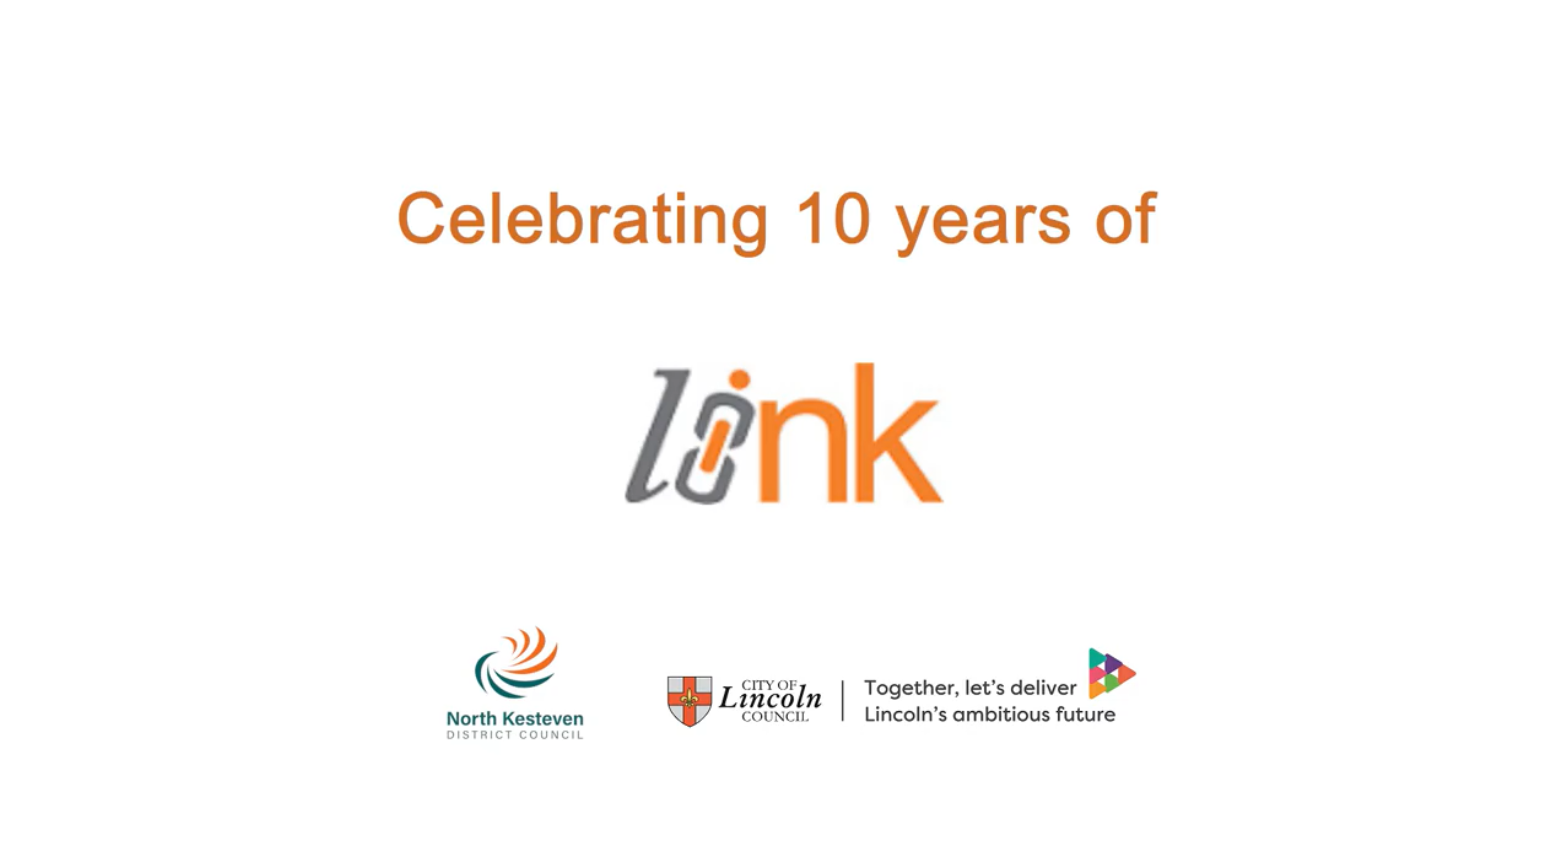 Link logo alongisde NKDC and COLC logos